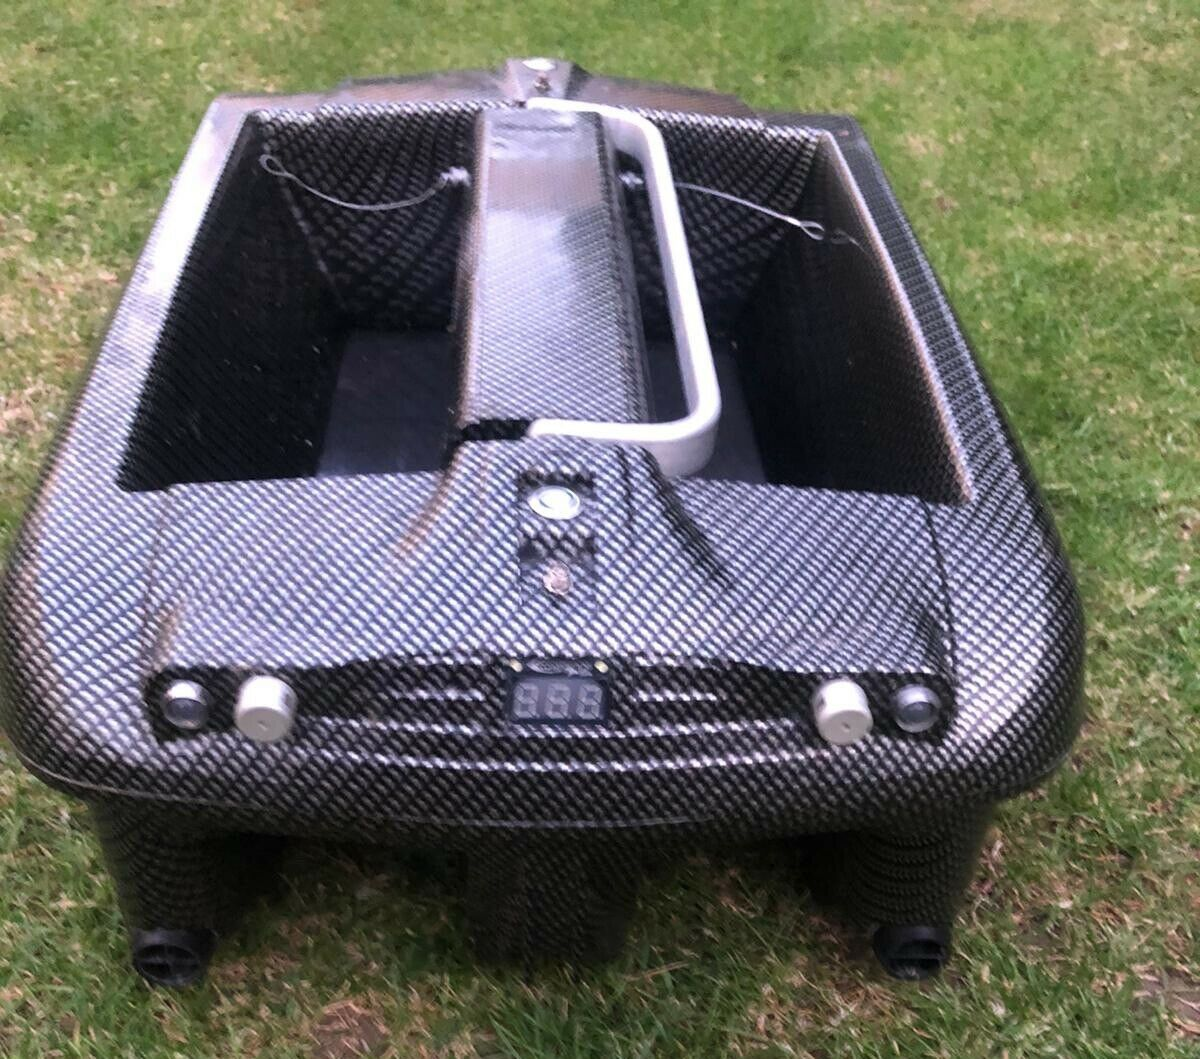 Ad - Carplounge RT4 Bait Boat On eBay here -->> https://t.co/bM27LDJofe  #carpfishing #<b>Bait